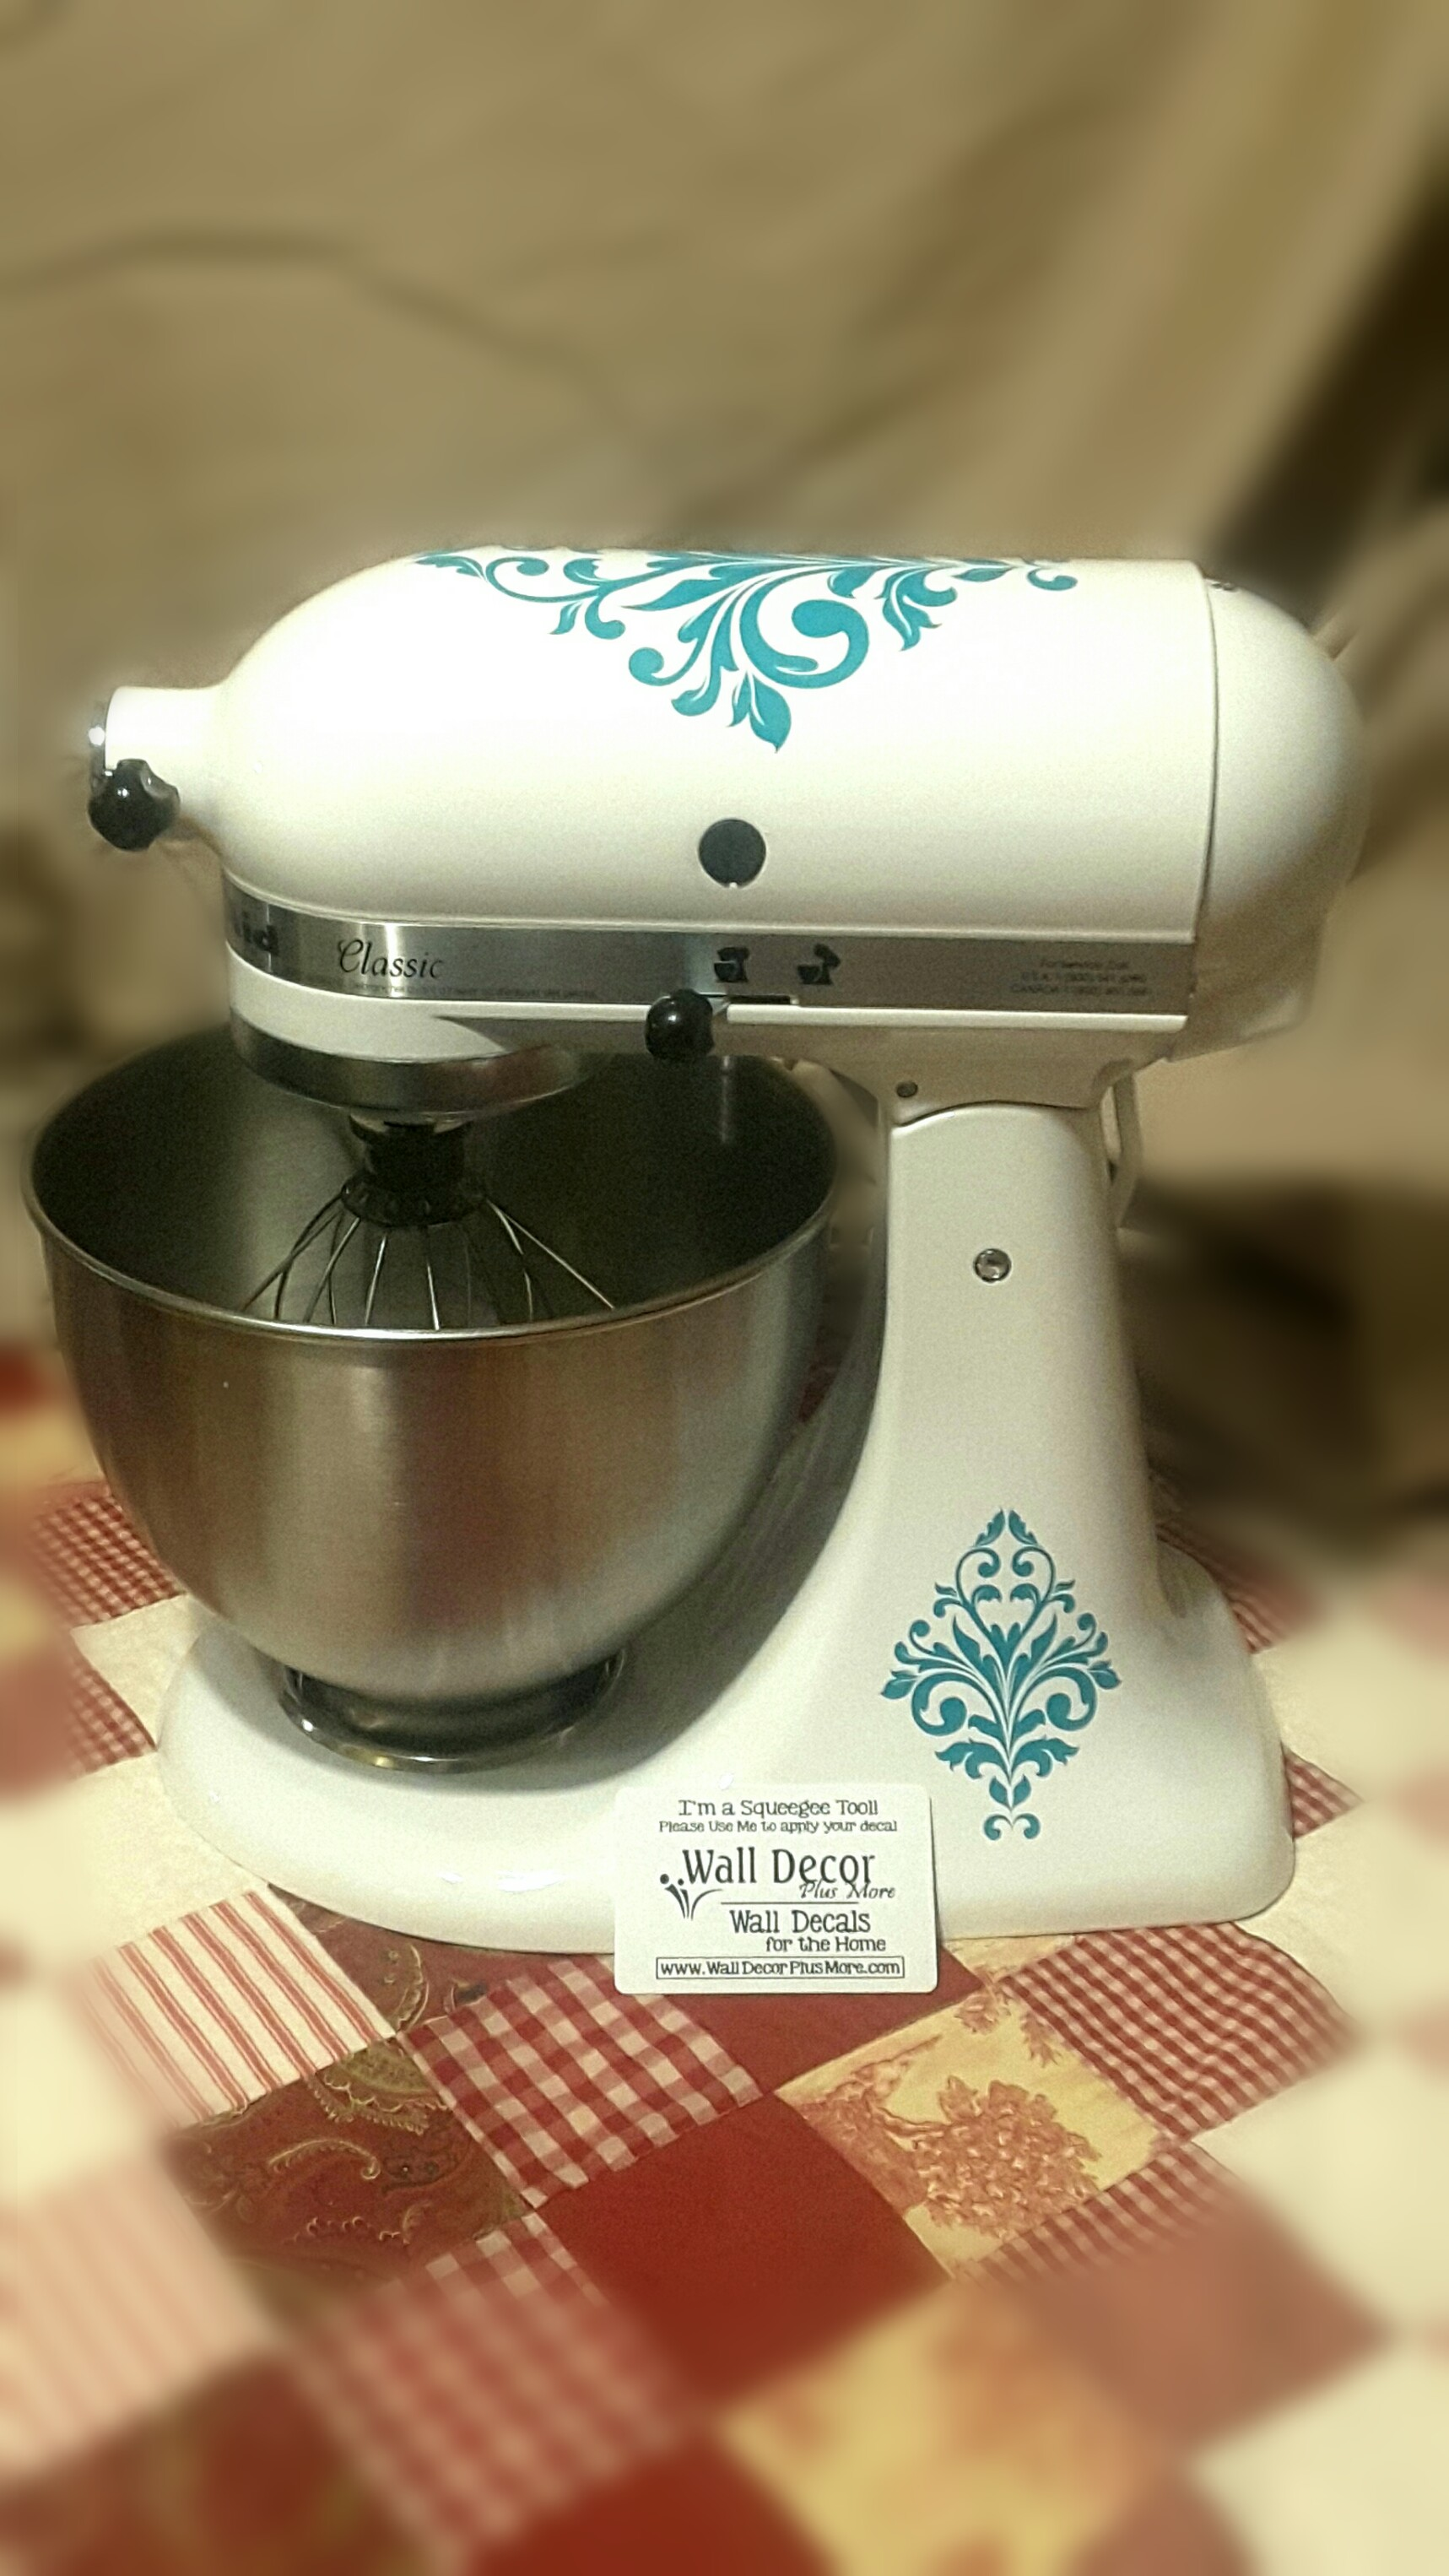 wd714-kitchenaid-mixer-decals-floral-medallion-picsart-01-11-09.46.40.jpg